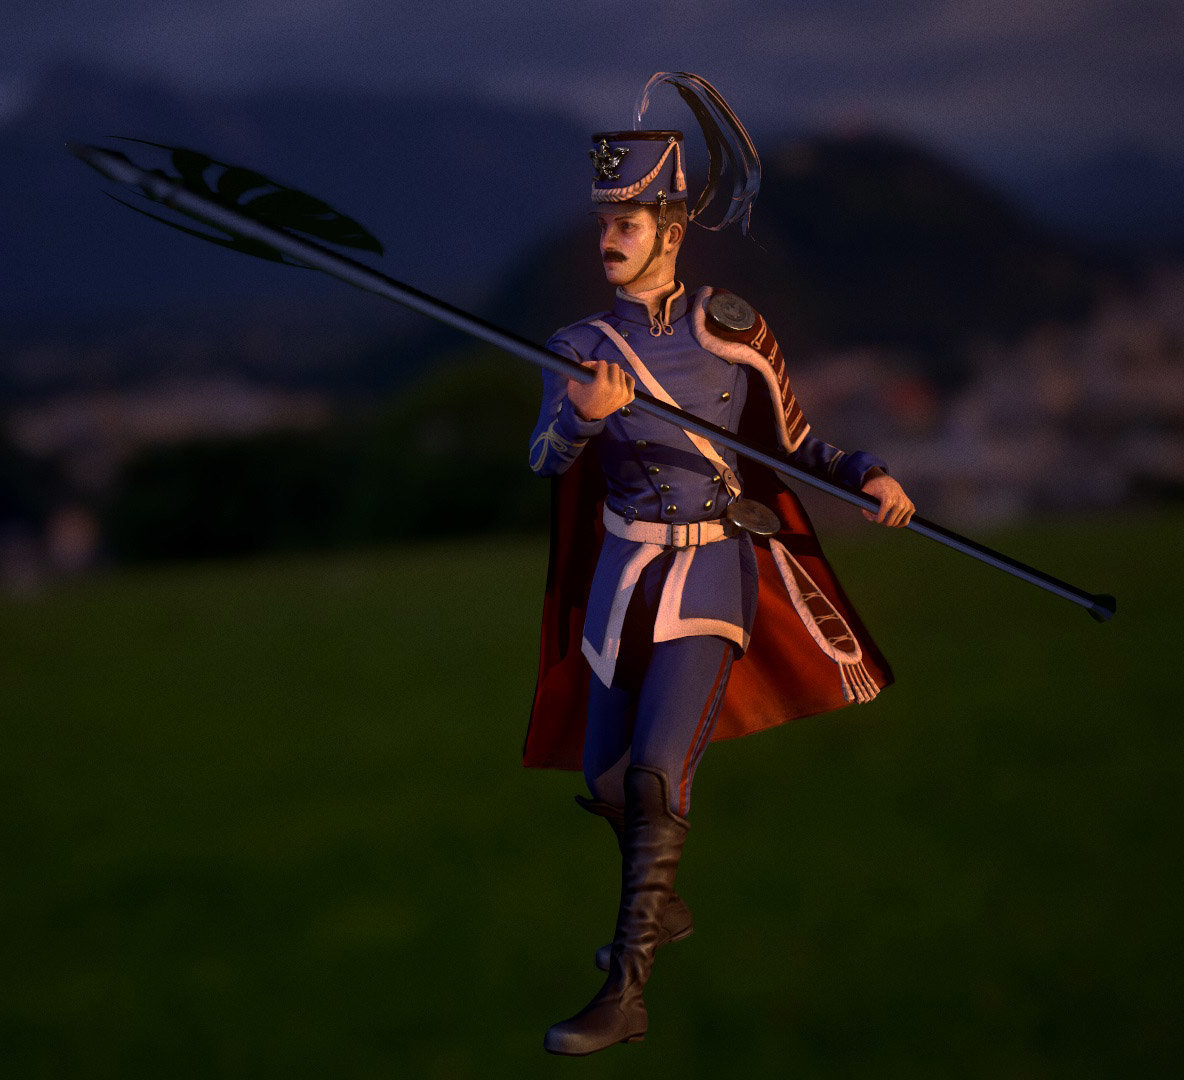 Luis santander soldier 3